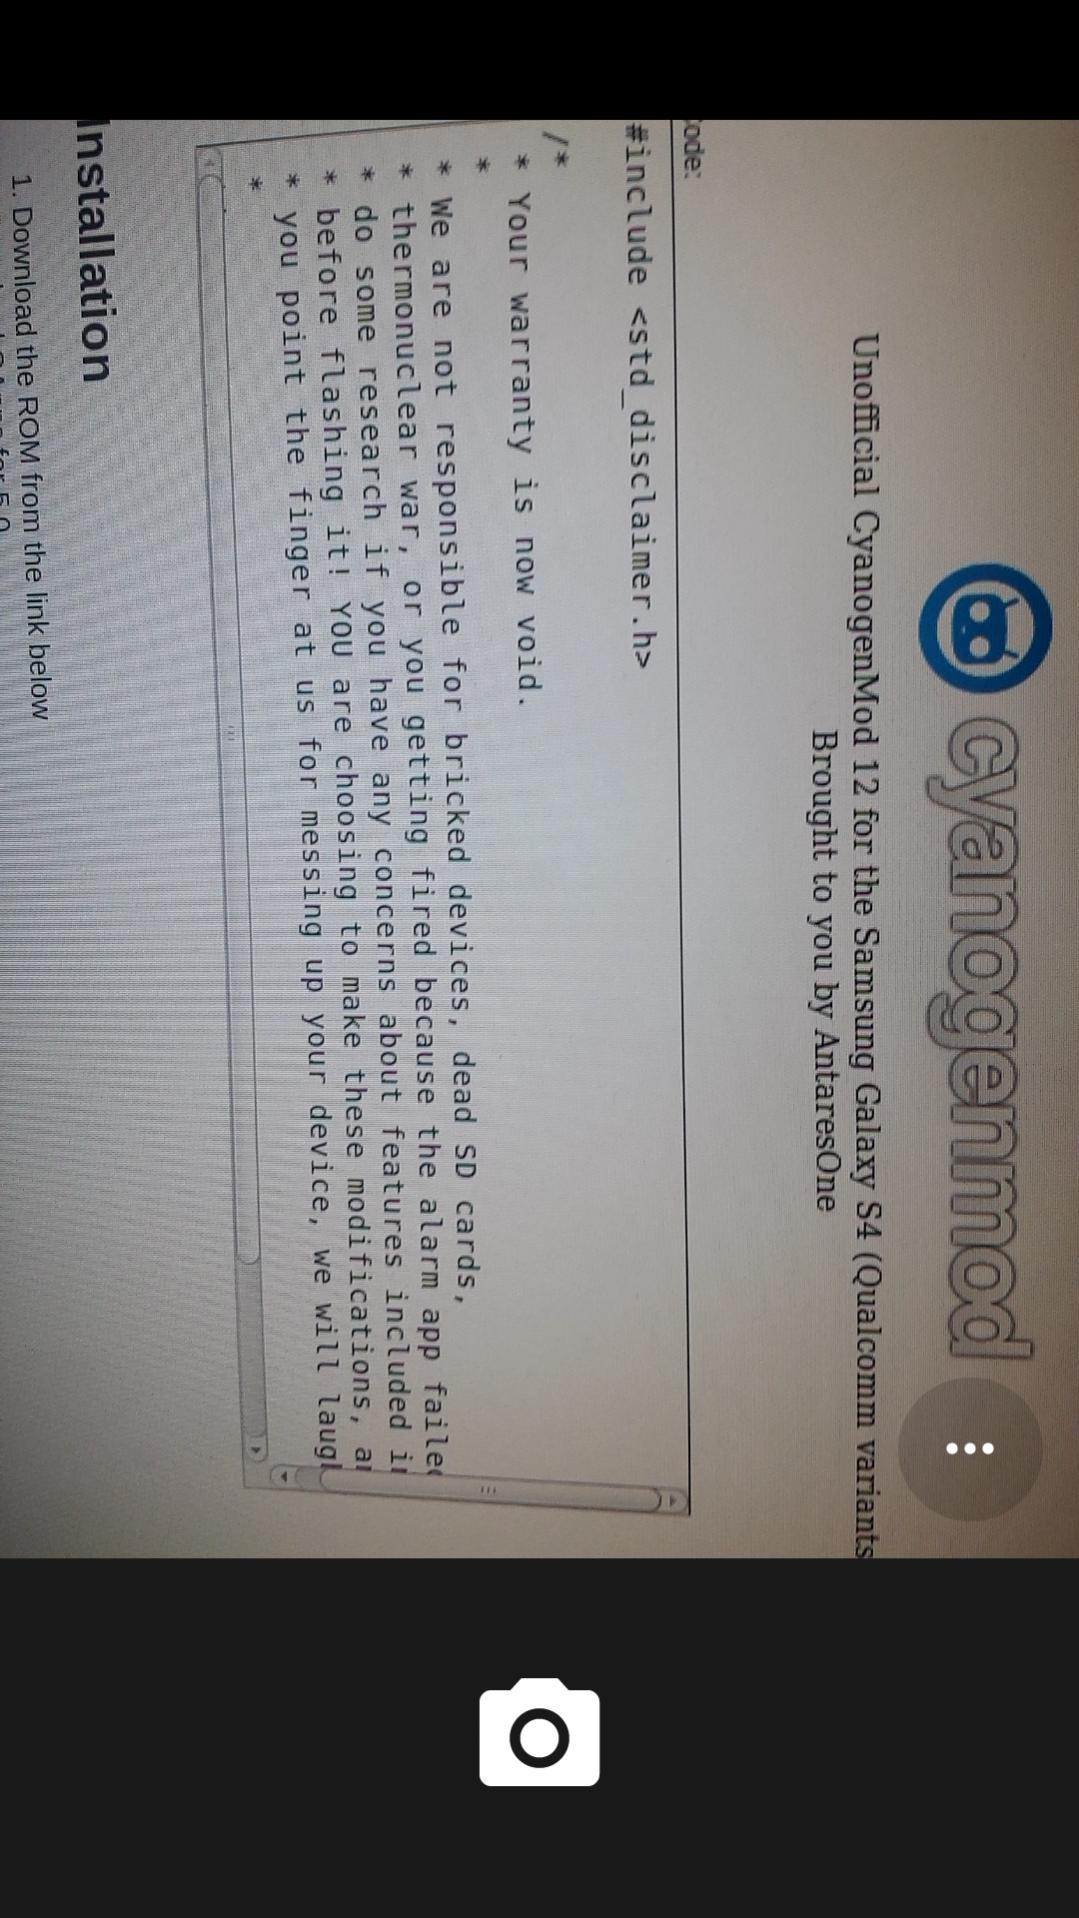 Samsung-Galaxy-S4-CyanogenMod-12-Android-5.0-Lollipop-7